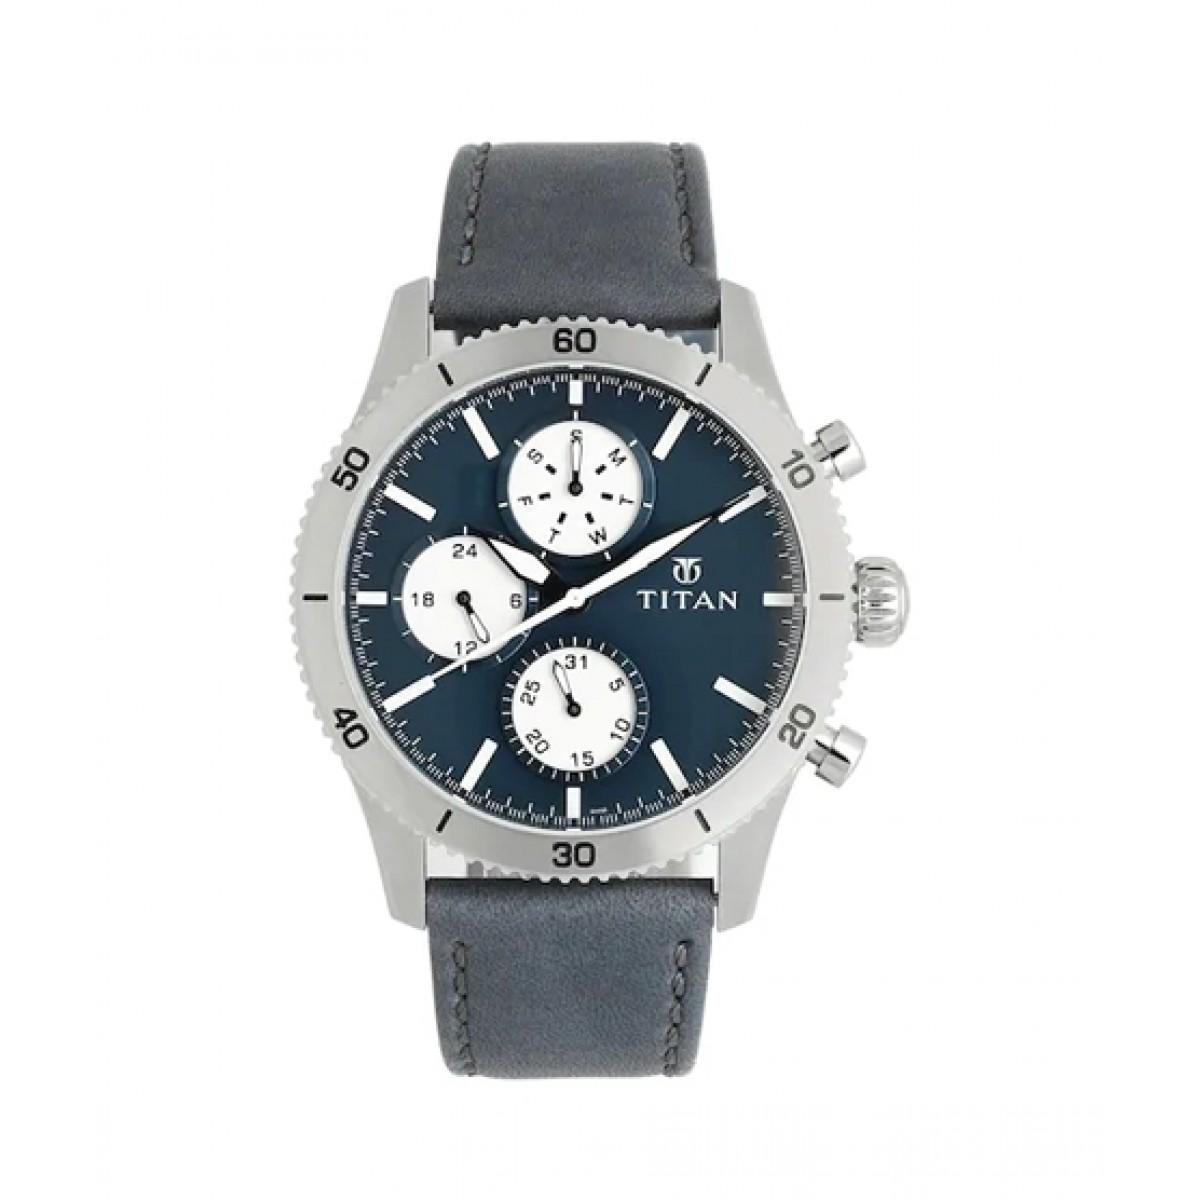 Titan Analog Men's Watch Blue (90105KL02)